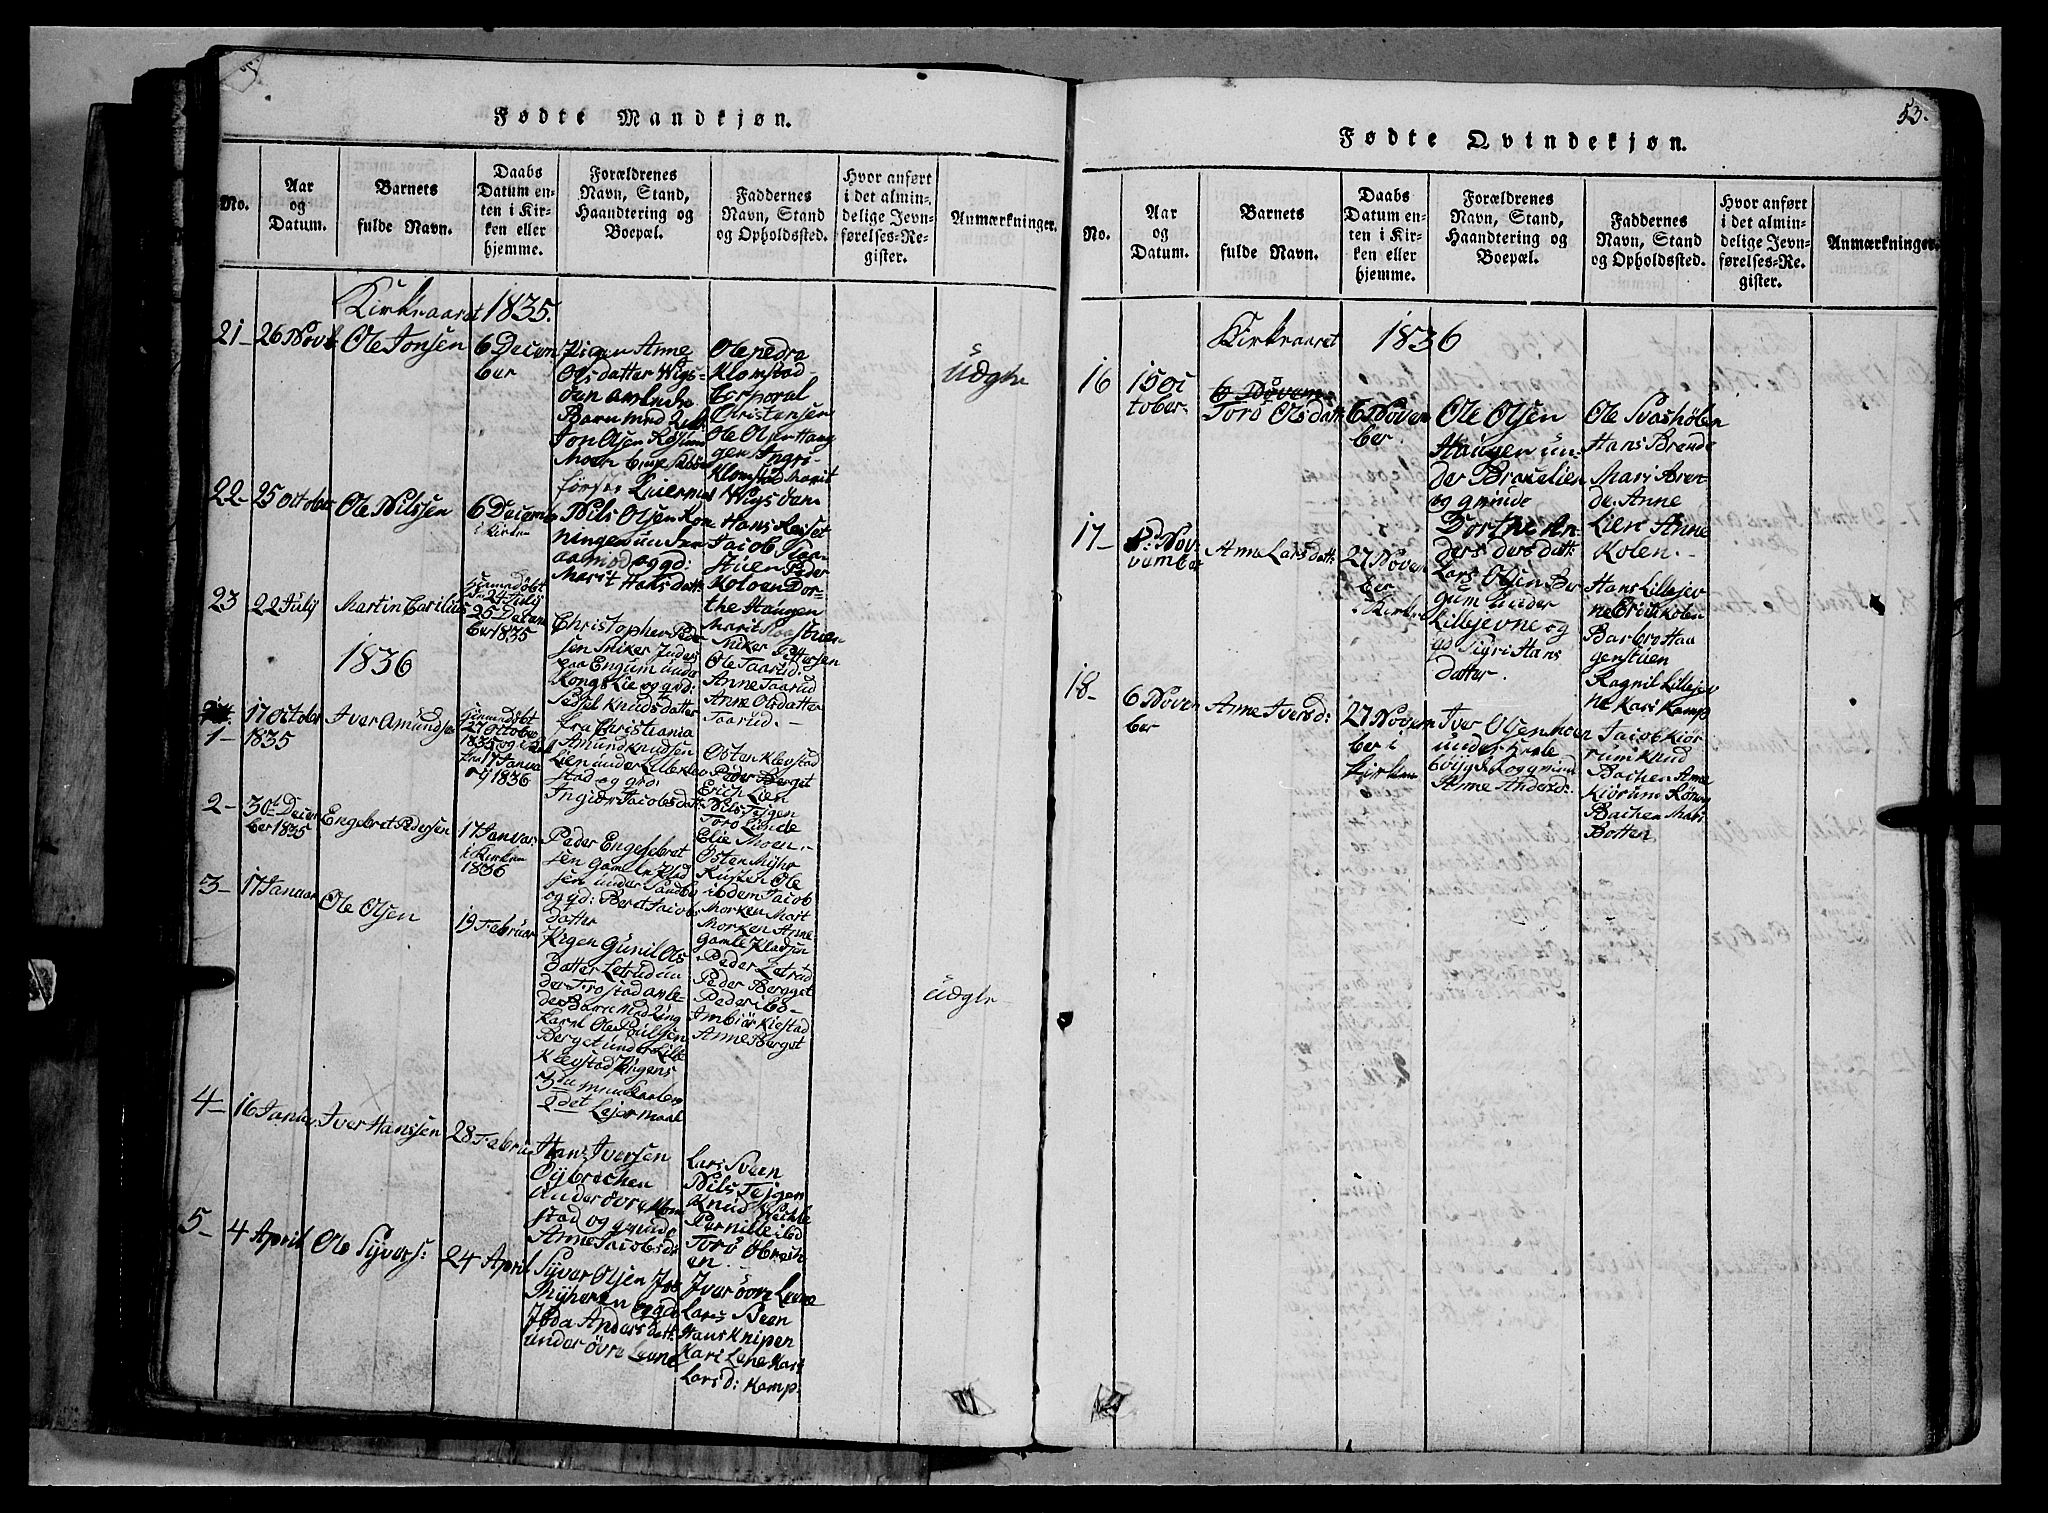 SAH, Fron prestekontor, H/Ha/Hab/L0002: Klokkerbok nr. 2, 1816-1850, s. 53